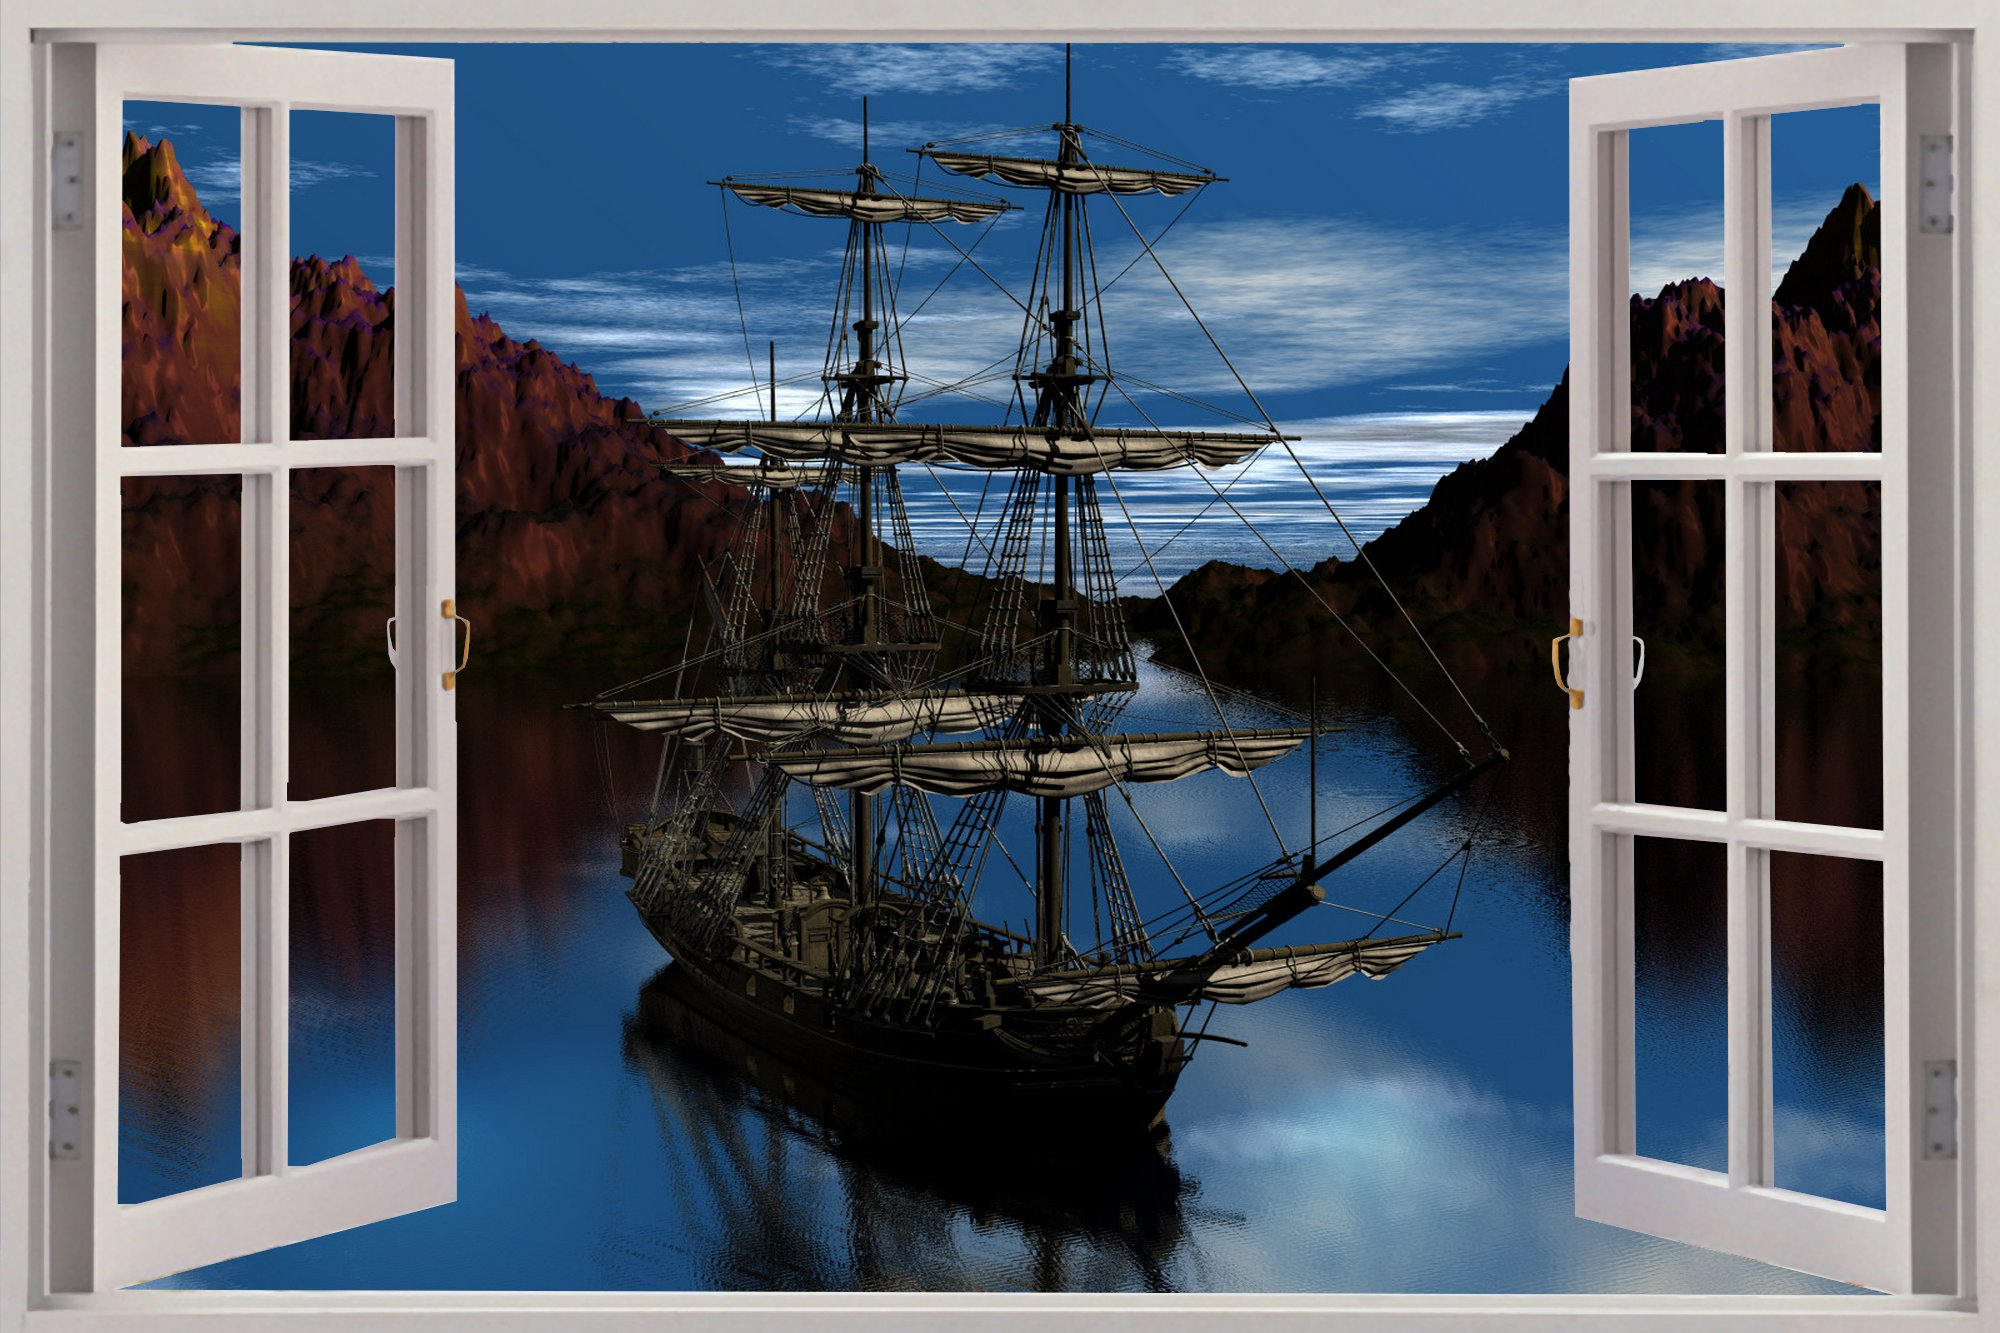 3D Window View Pirate Schooner Ship Wall Decal Sticker Frame Mural Effect  Home Decor Bedroom Living Room Kitchen Bathroom Nursery 505